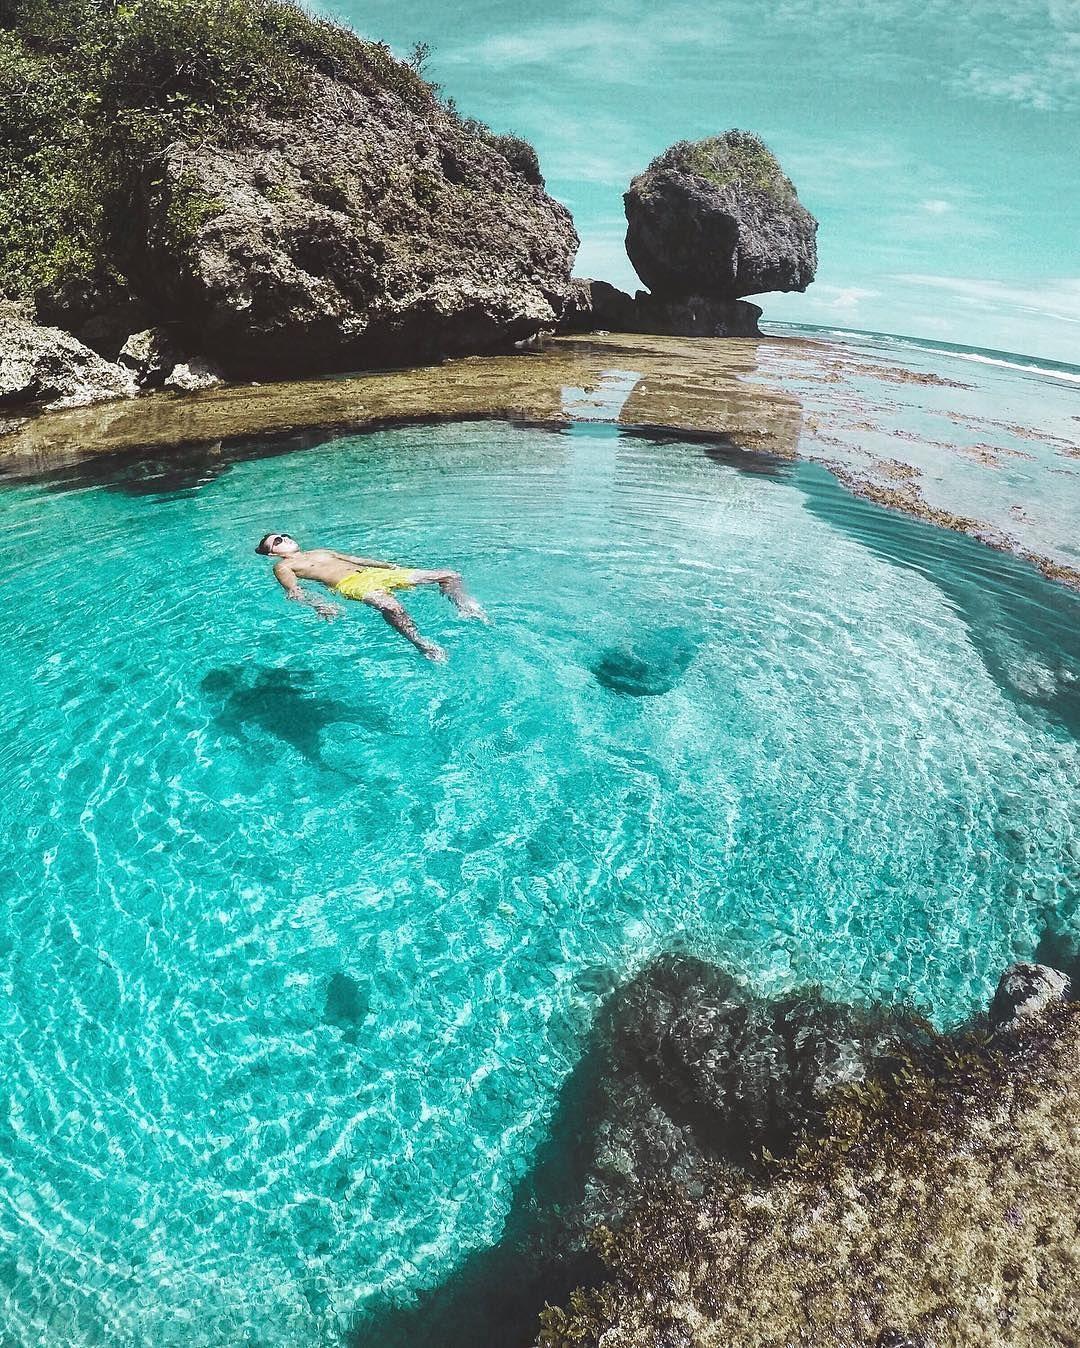 📍Magpupungko Rock Pools, Siargao, Philippines 🇵🇭 | Siargao island